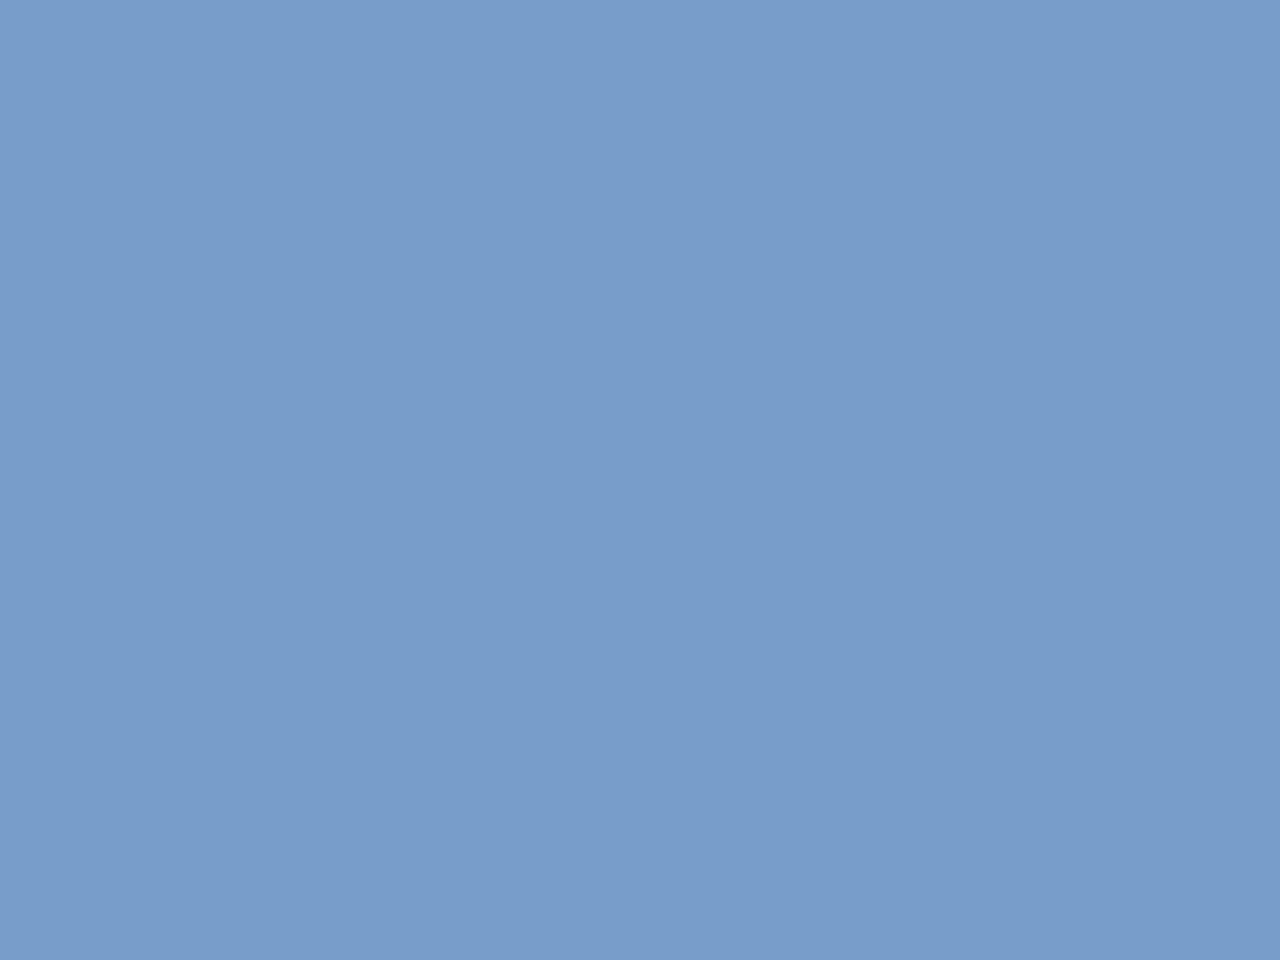 1280x960 Dark Pastel Blue Solid Color Background